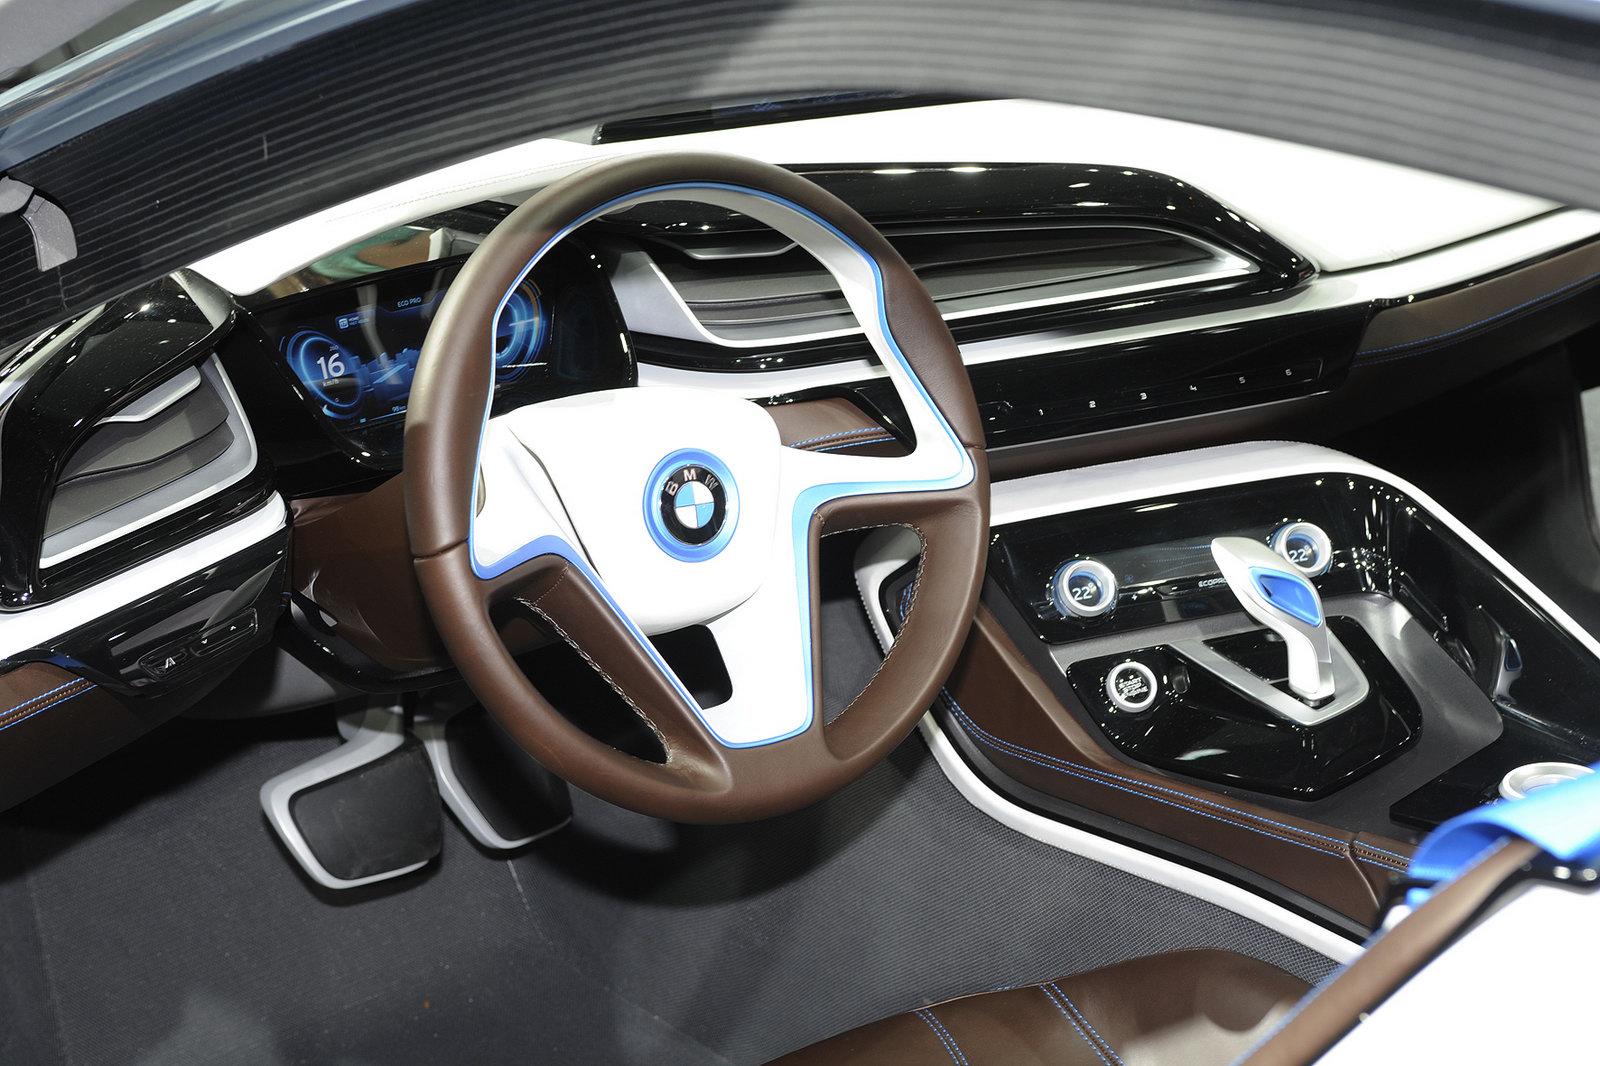 BMW i3 at the Frankfurt Motor Show